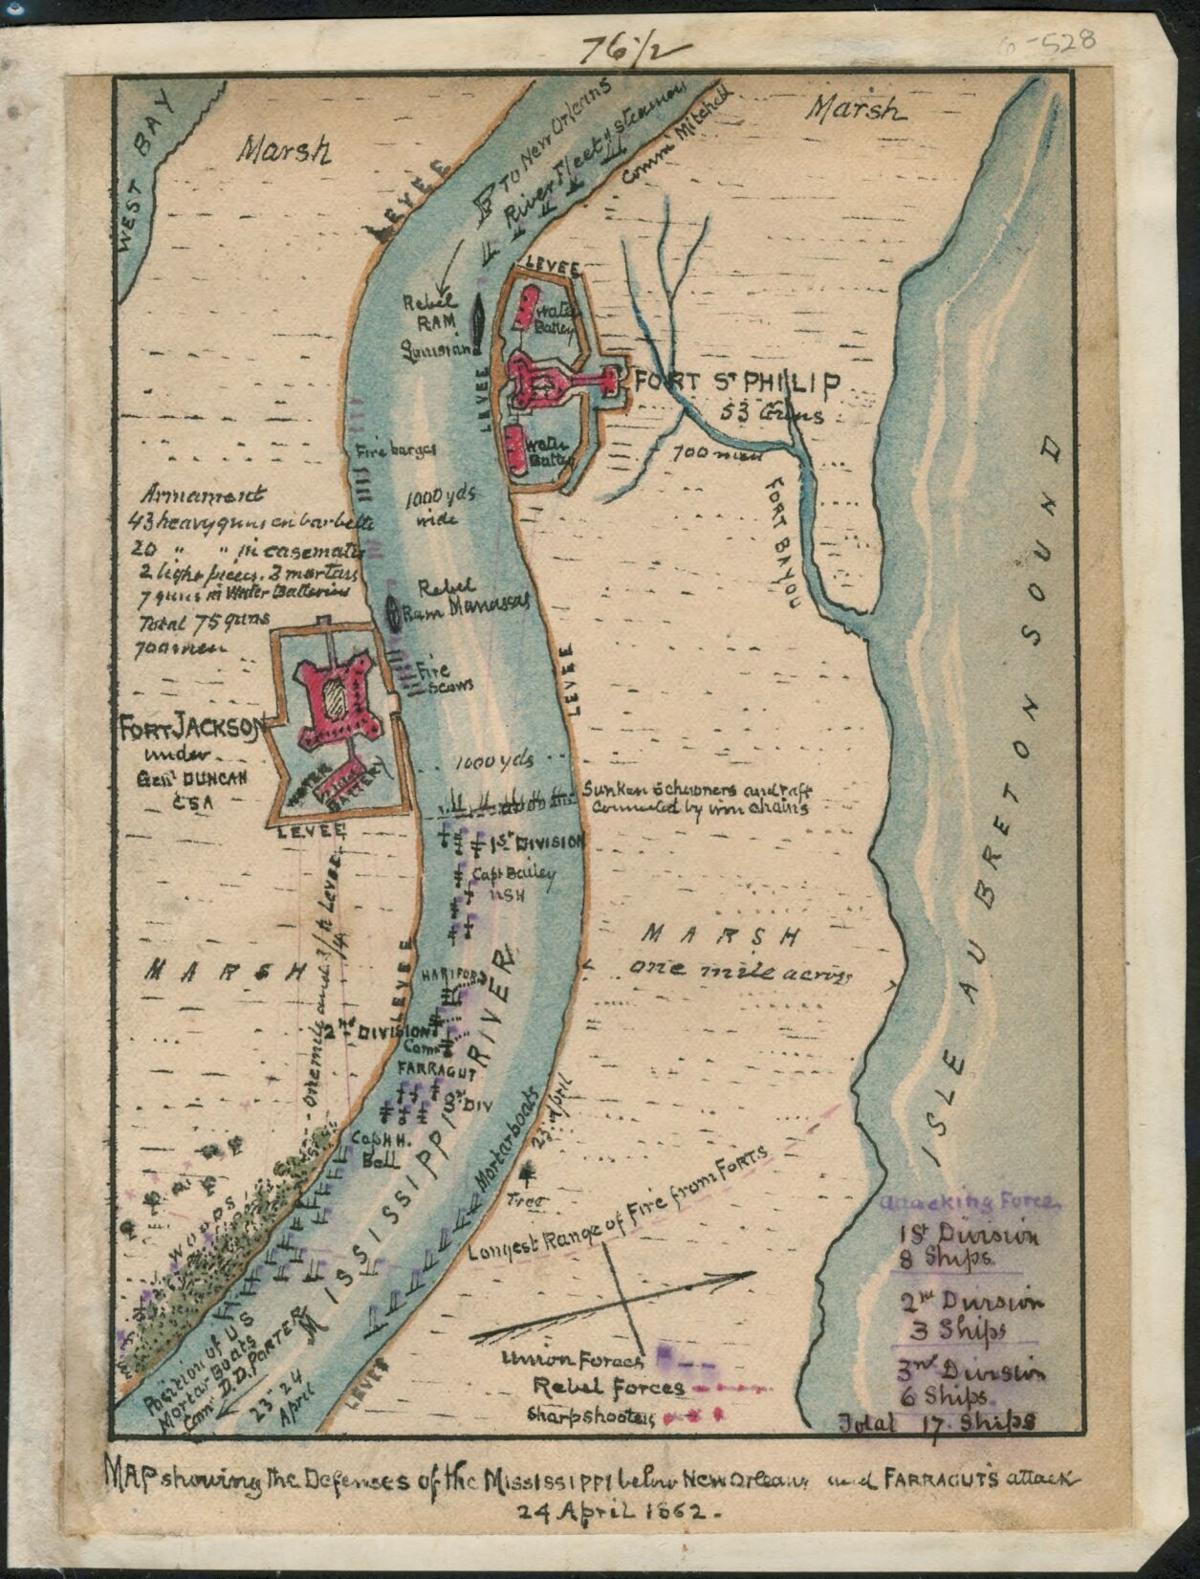 Fort Jackson map